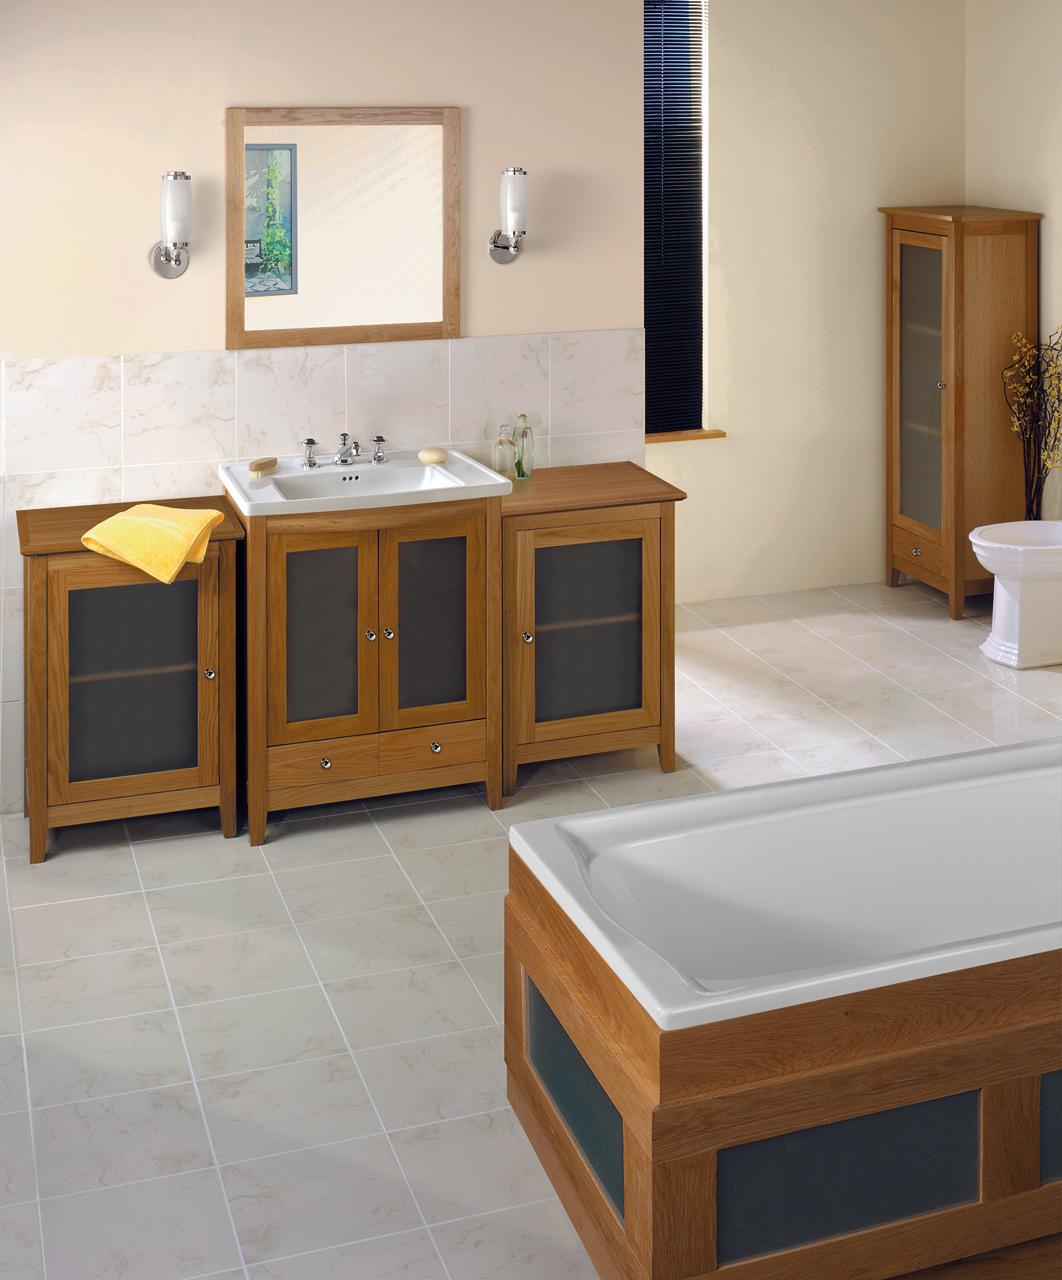 Classic Bathrooms: Imperial Bathrooms - More-left-retouch